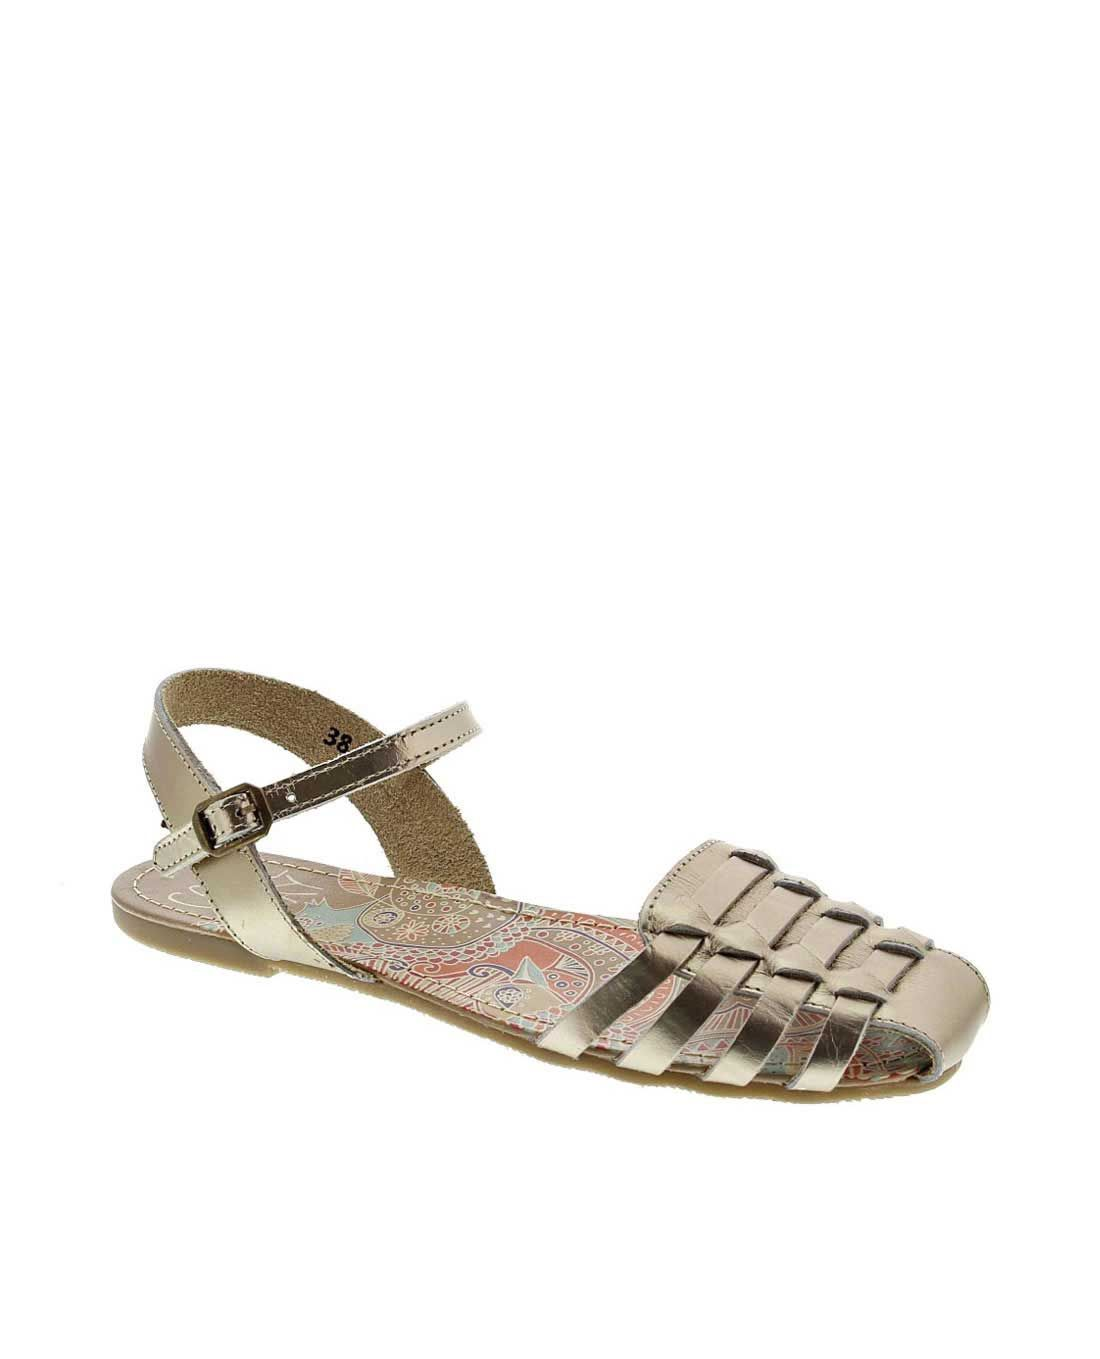 e55e6085bb1 Sandalias planas Coolway doradas Root   Pies   Sandalias, Zapatos y ...